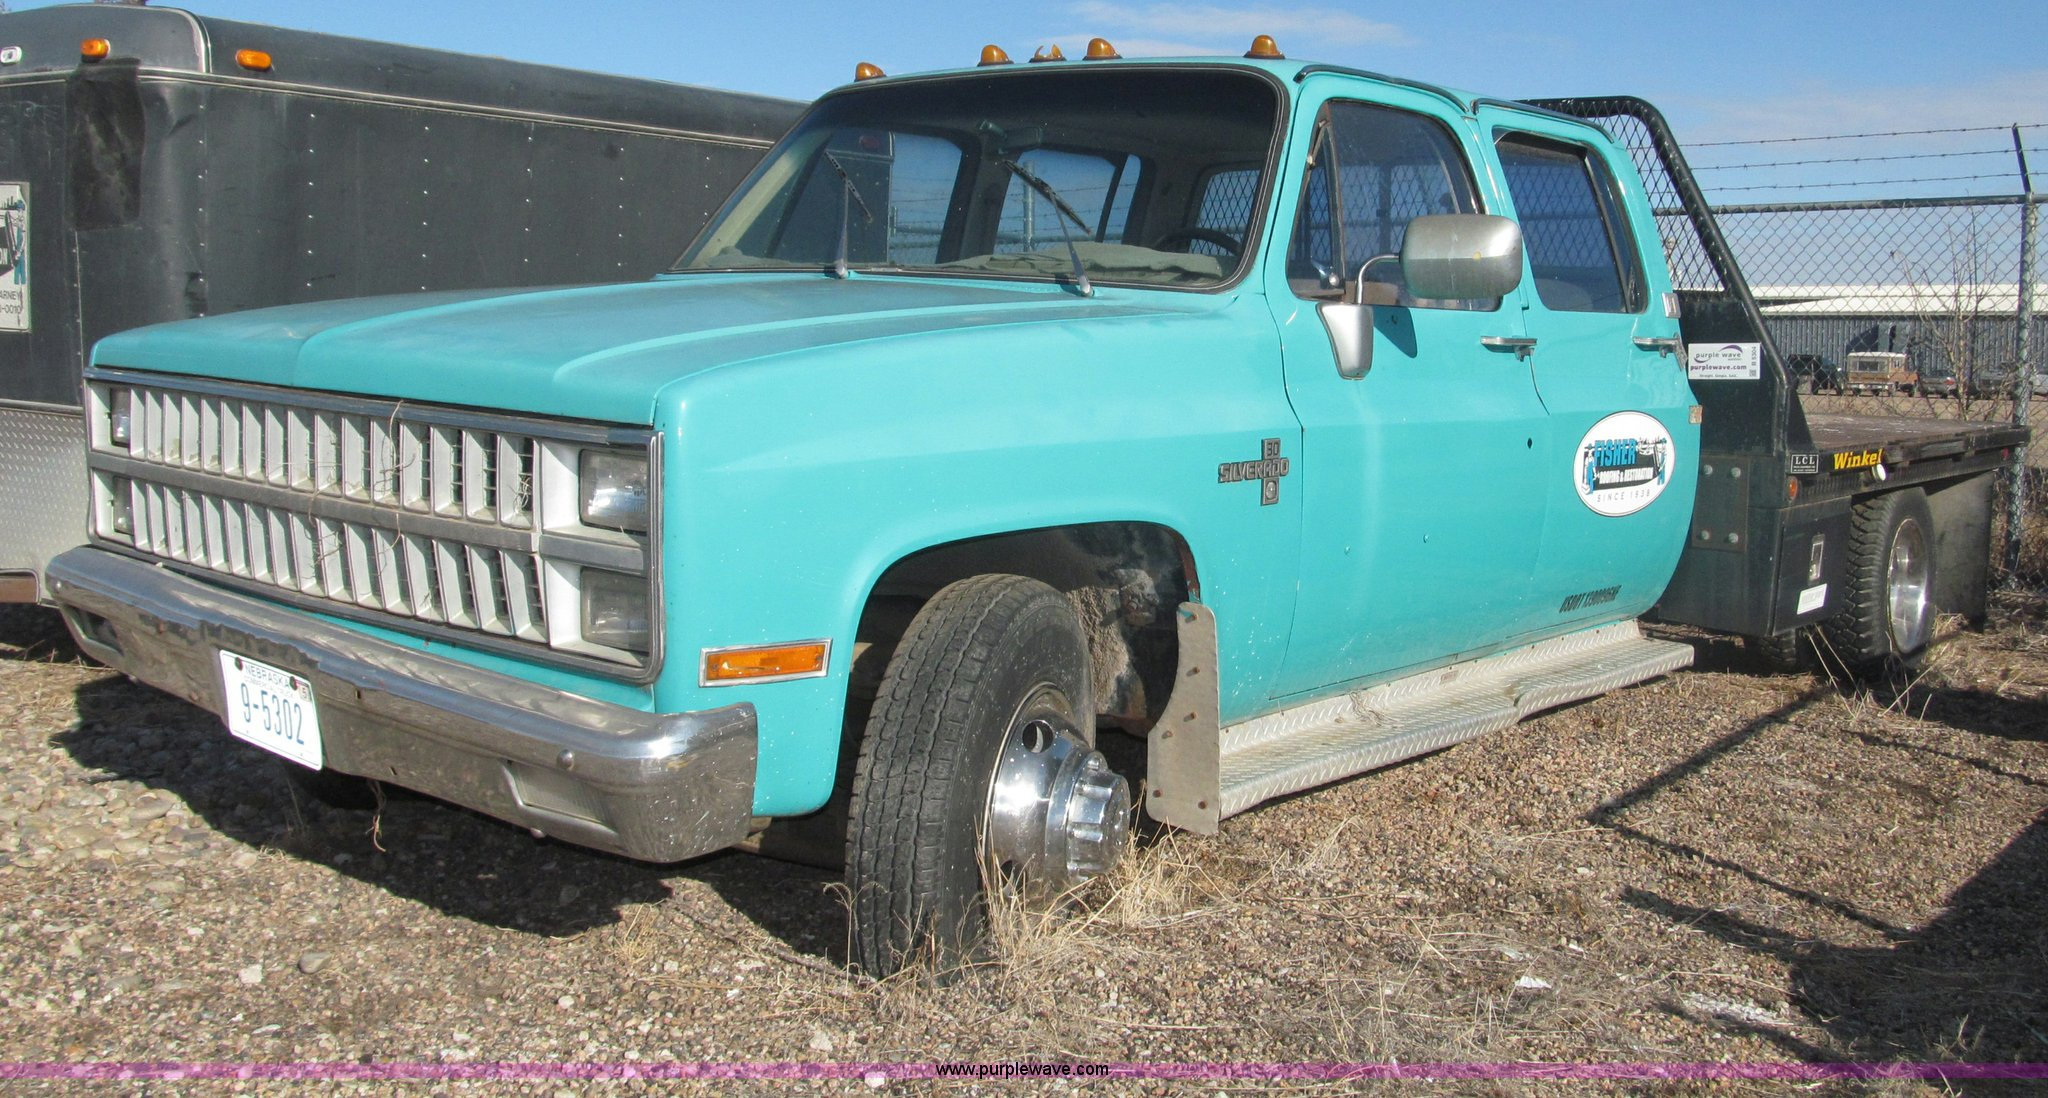 1982 Chevrolet Silverado C30 Flatbed Truck Item B5304 So